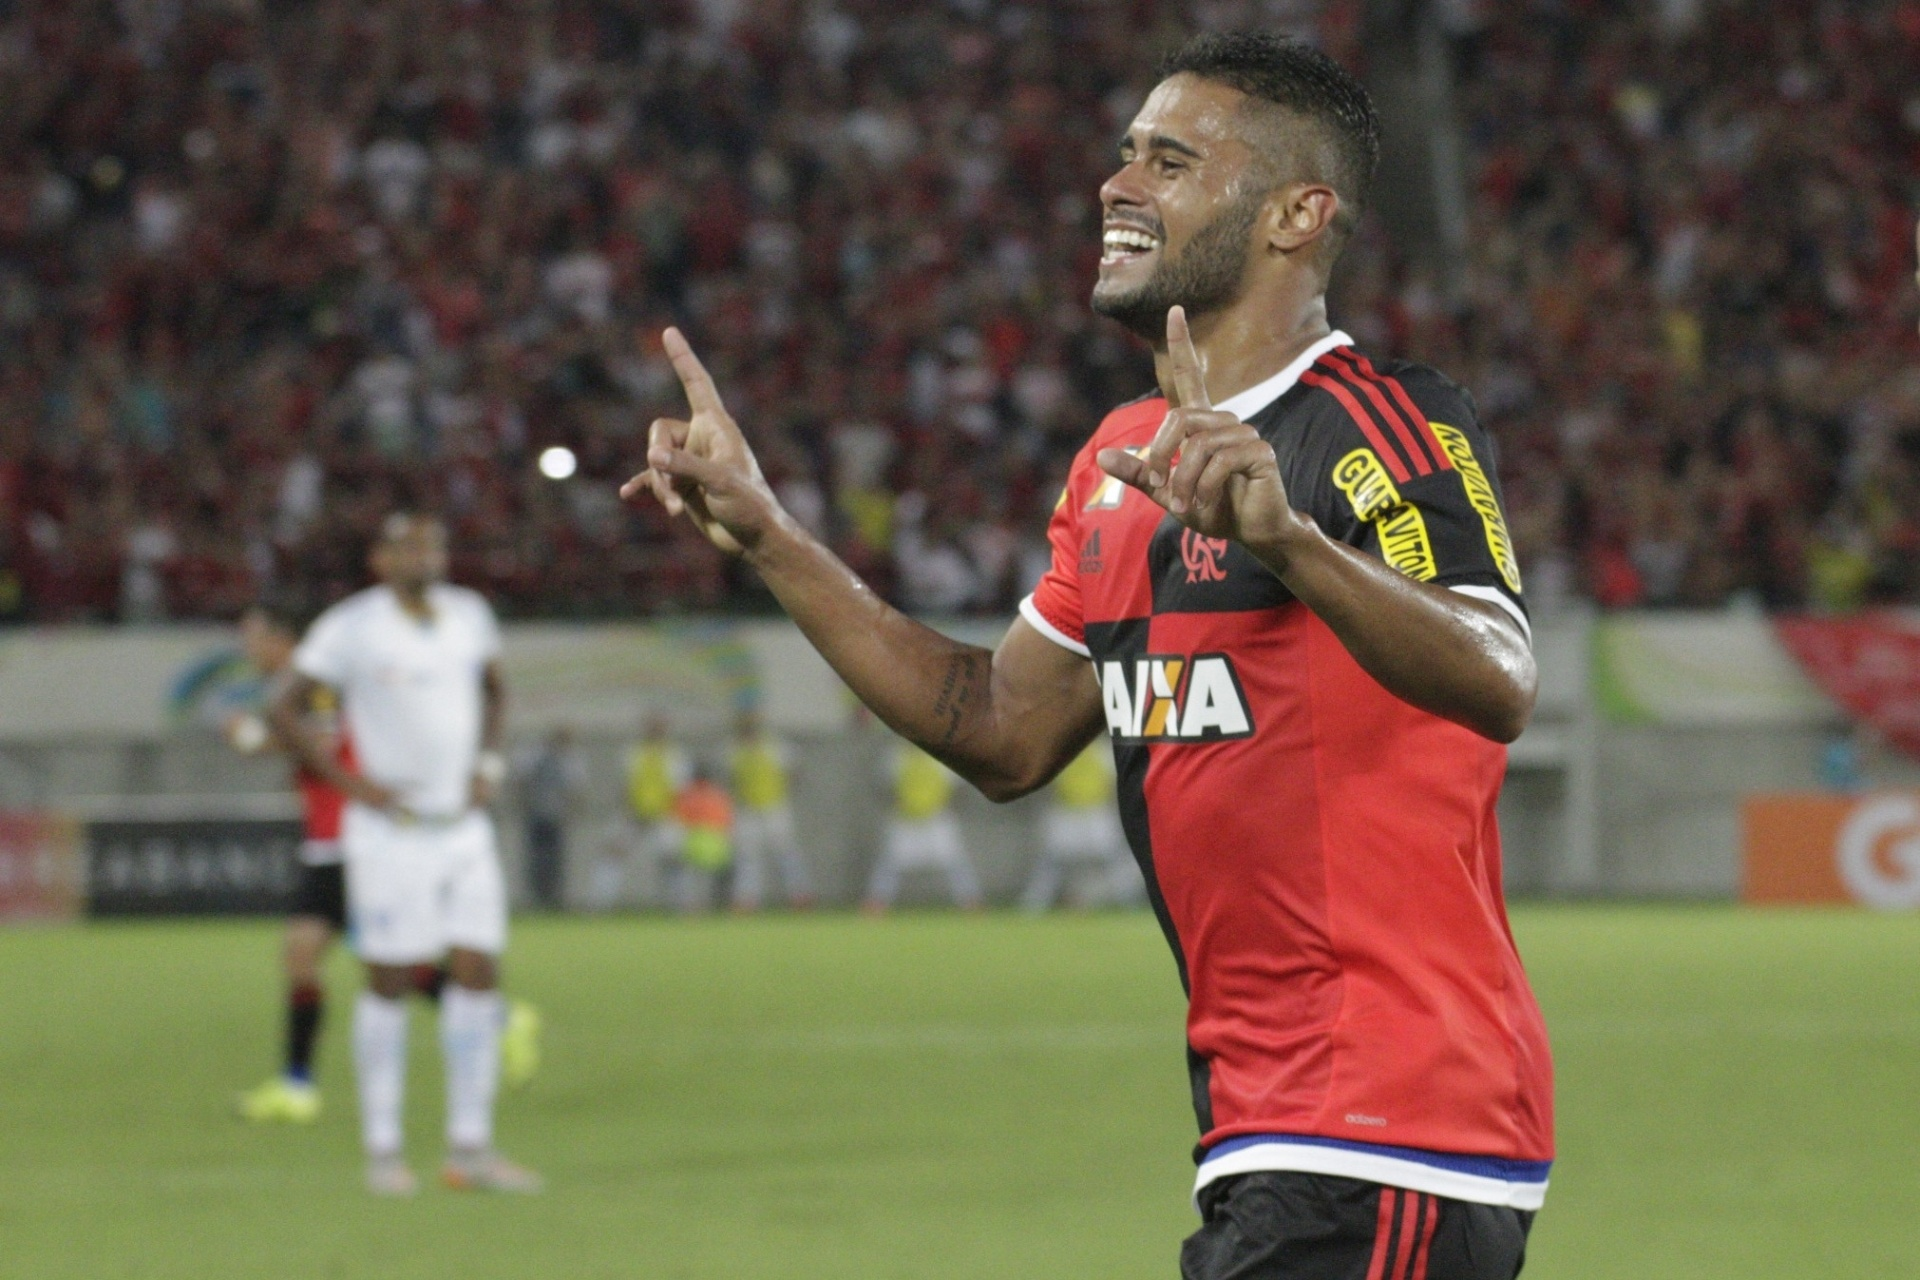 Renato admite interesse do Grêmio em Kayke 3d22cadfad1ab